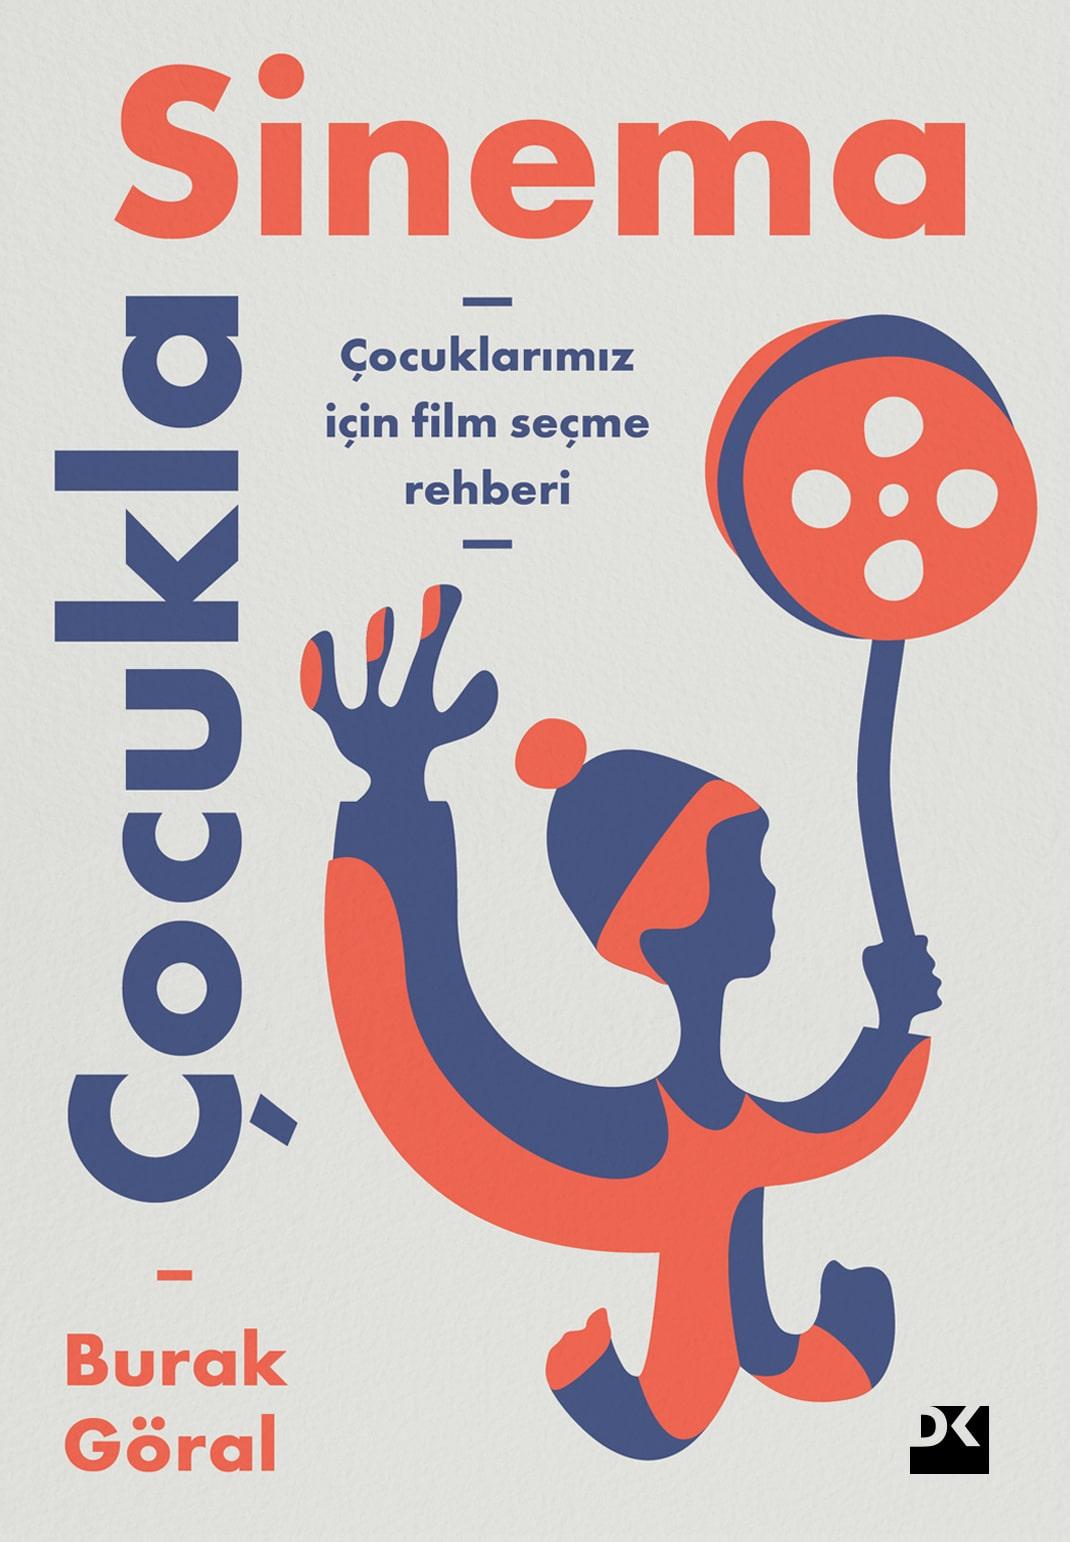 cocuklu_sinema-min